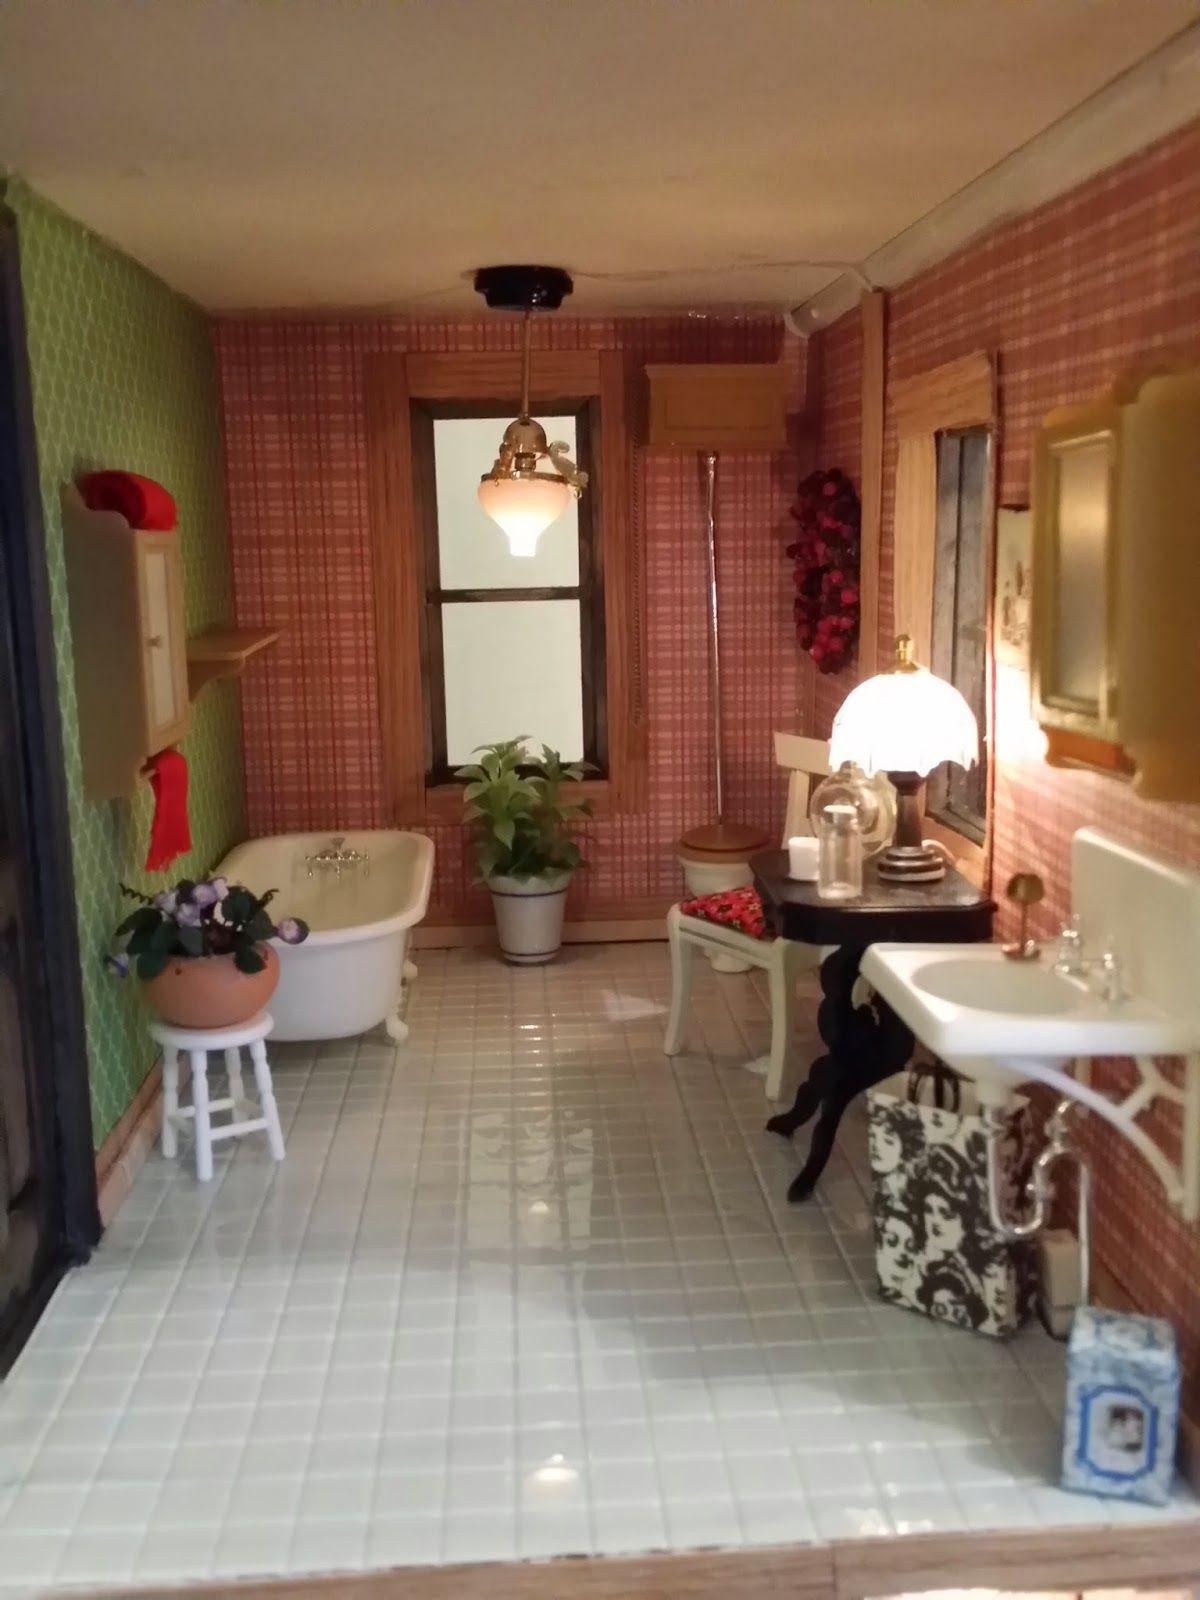 Greggsminiatureimaginations February 2014 Bathroom Model Wood Strips House